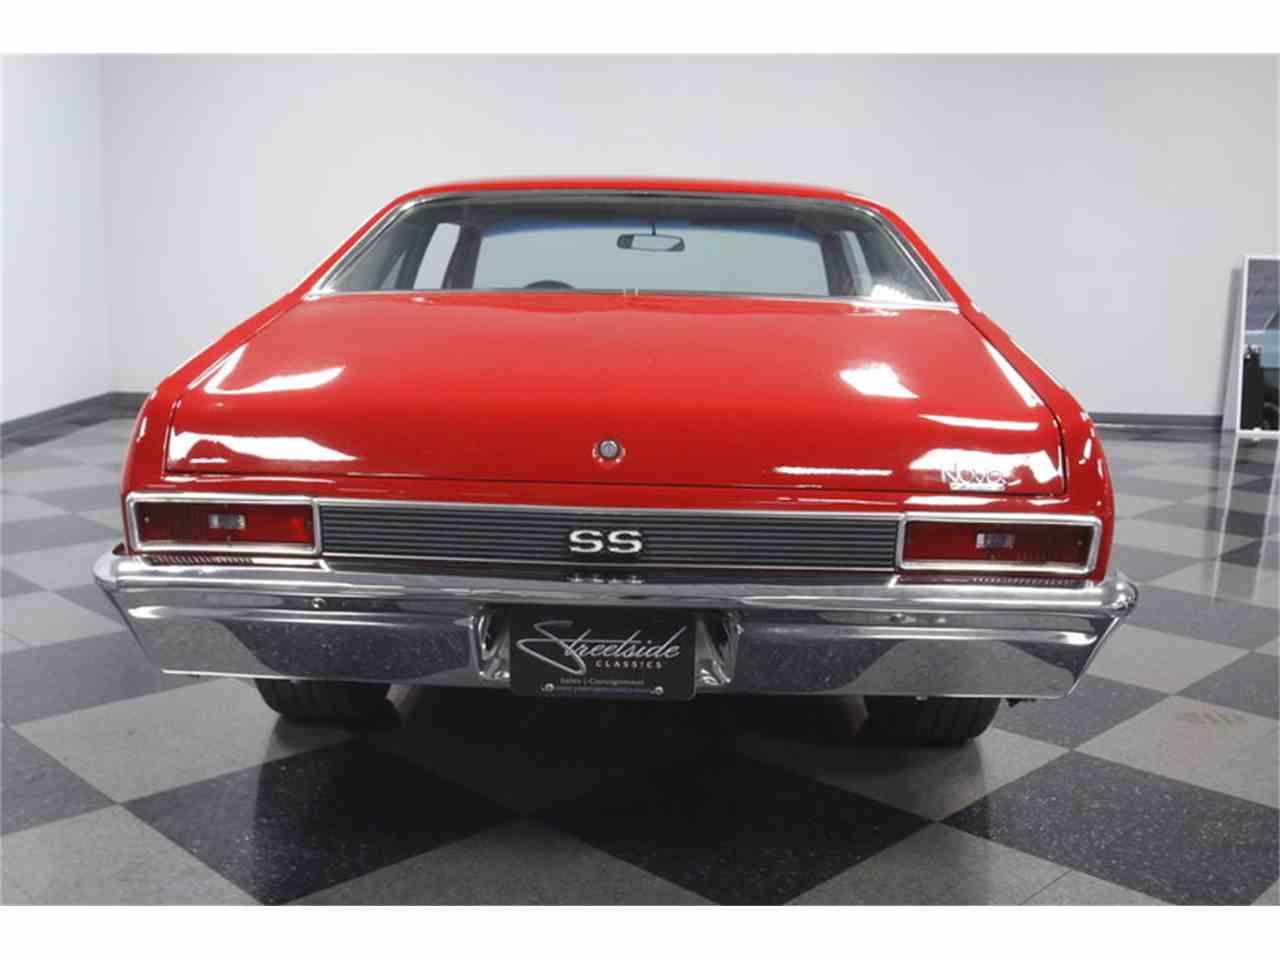 Large Picture of Classic '70 Nova SS located in Concord North Carolina - $21,995.00 - M5KQ